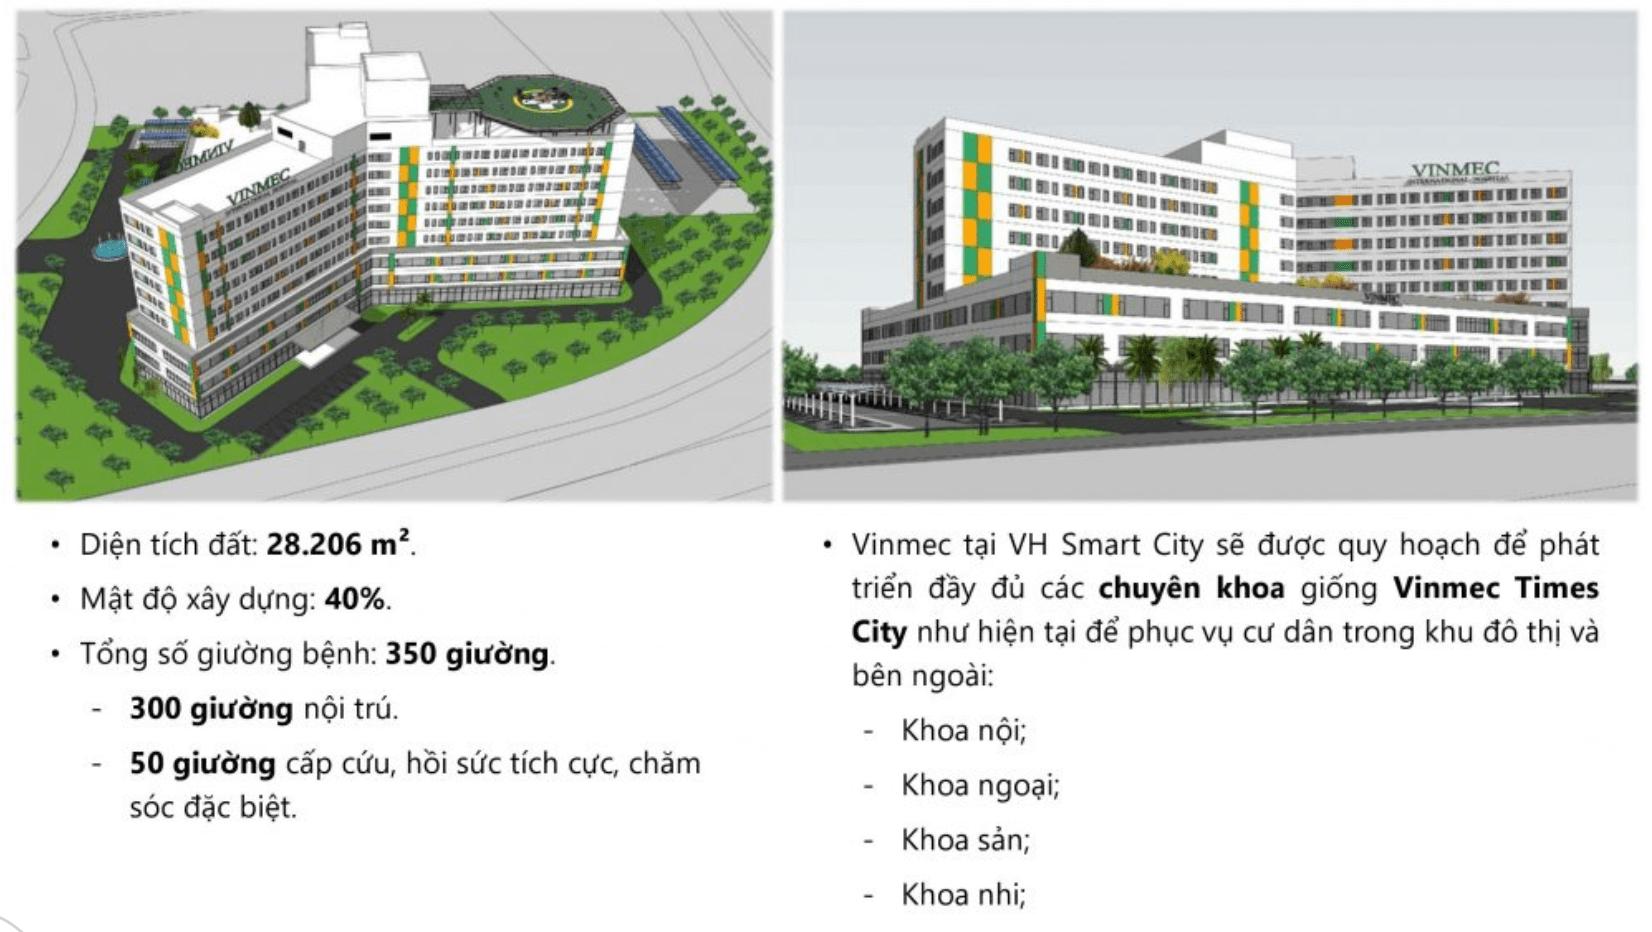 bệnh viện vinmec vinhomes smart city